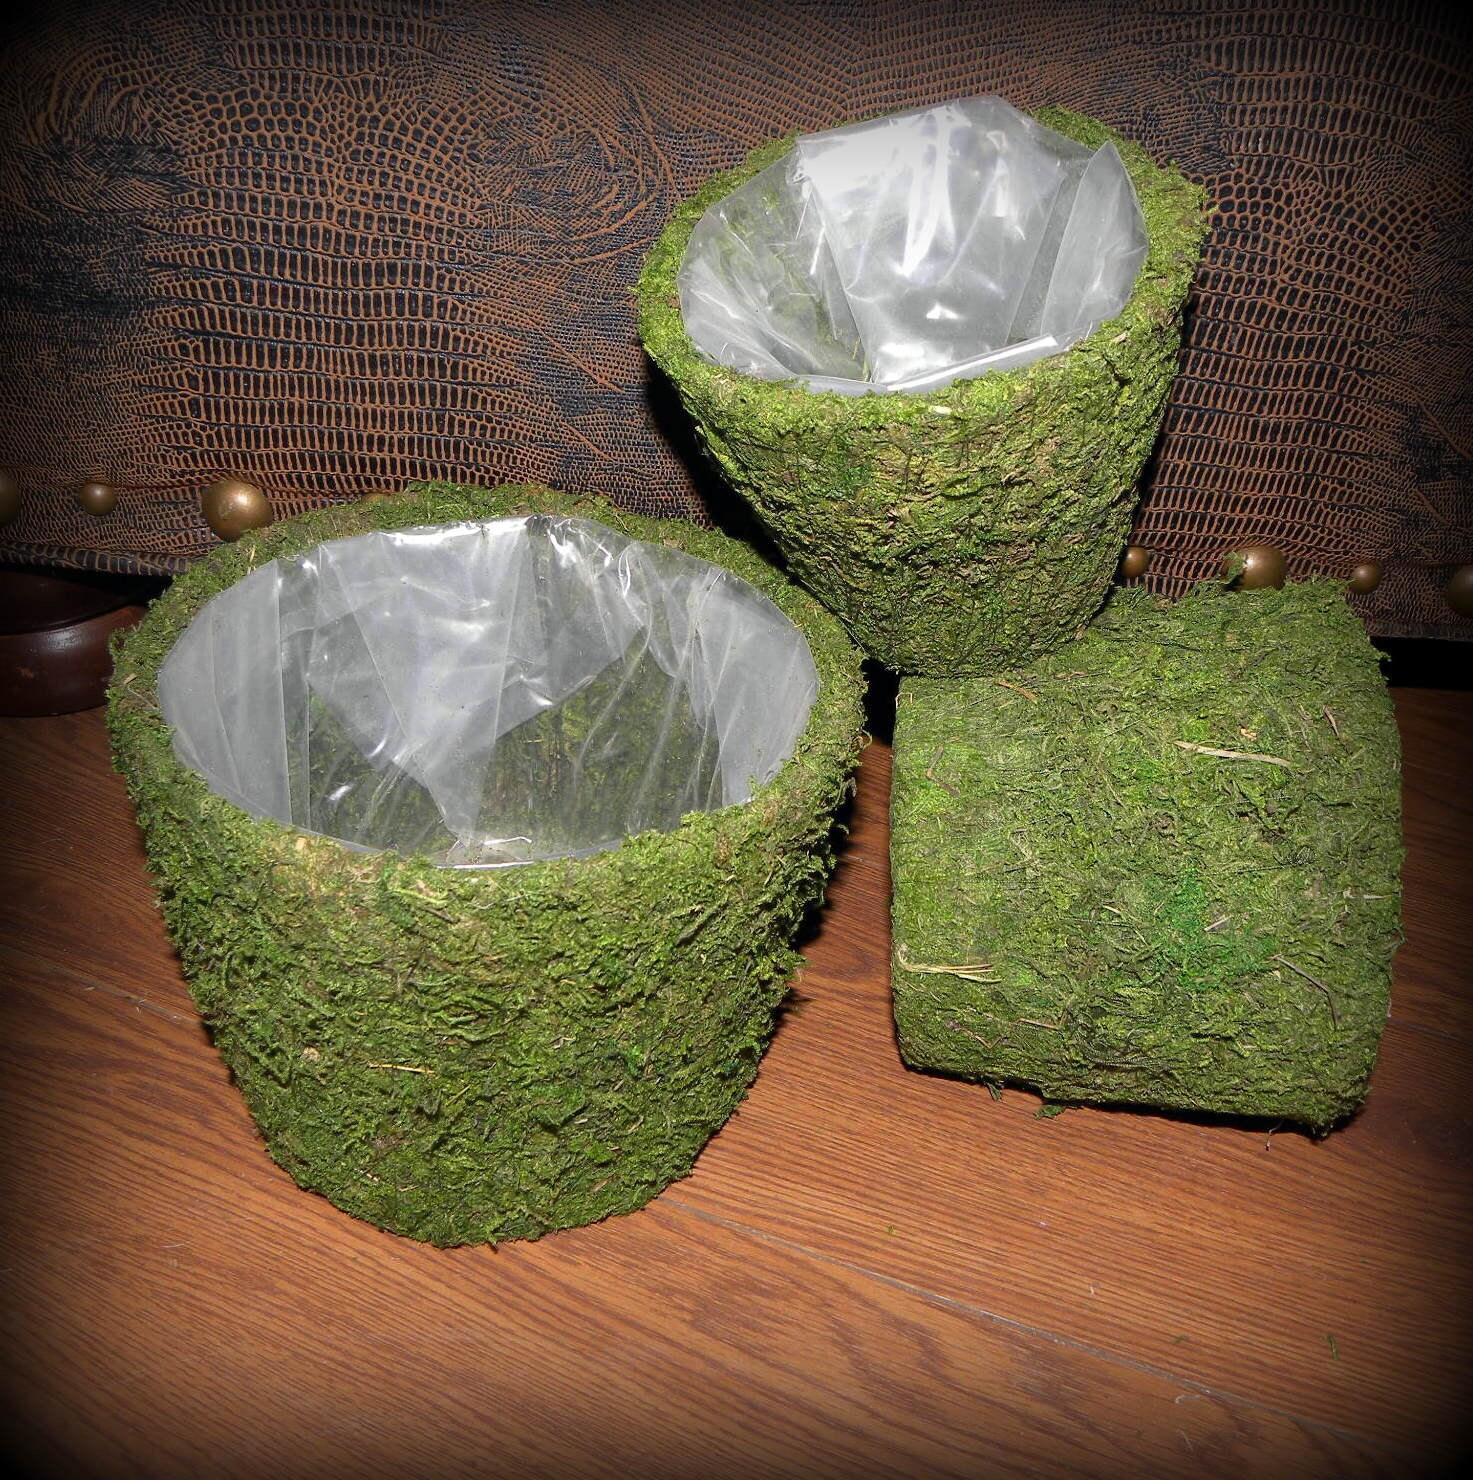 Moss baskets Creekside Set of 3 Moss Basket planters-Wedding decor-Bonsai-Orchid Baskets-Soft green preserved moss